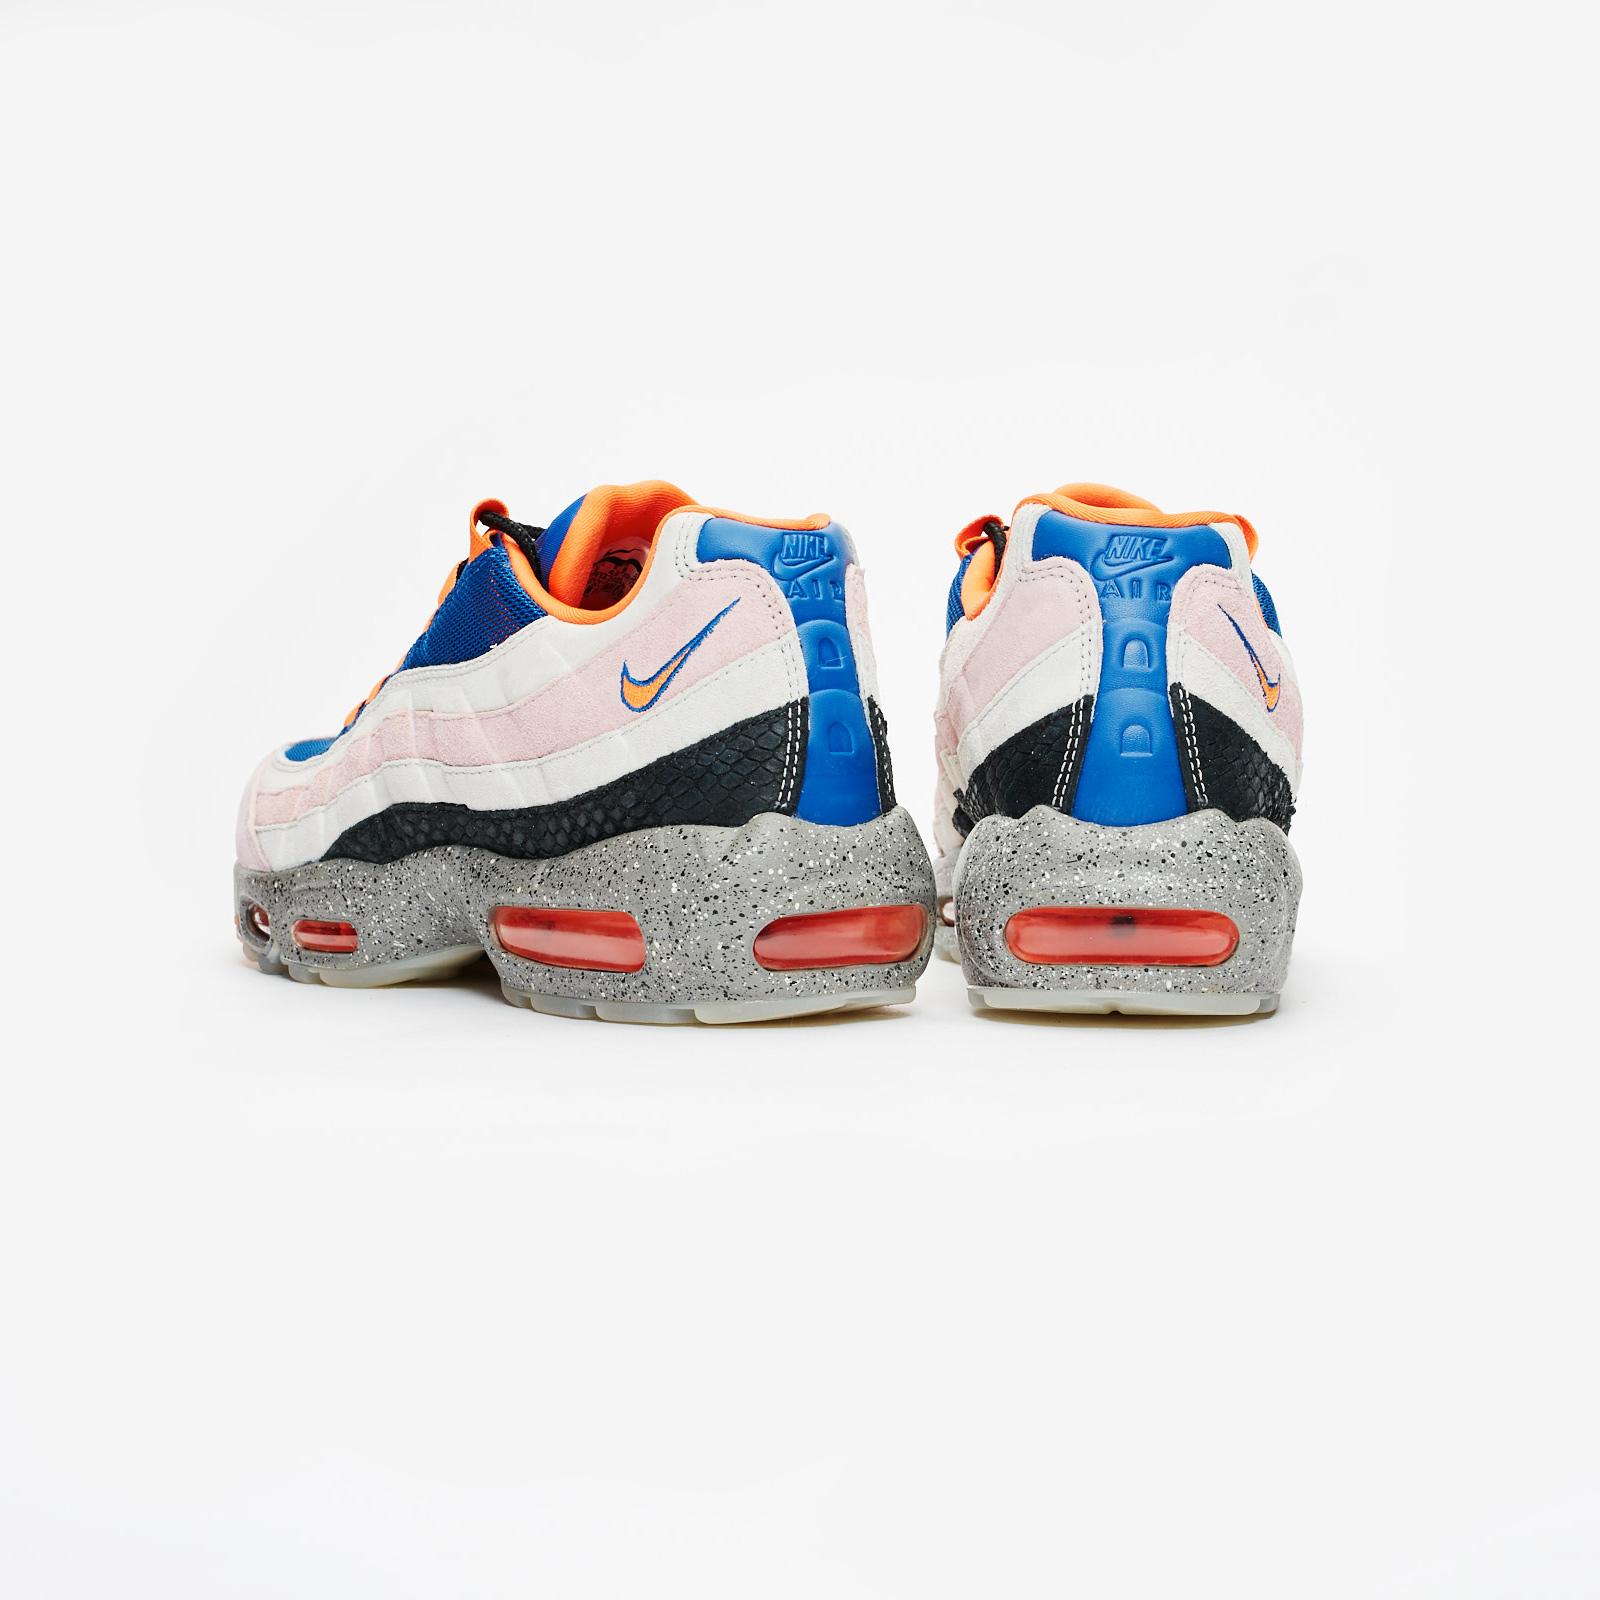 info for 50b8b fc333 Nike Air Max 95 - Av7014-600 - Sneakersnstuff | sneakers ...